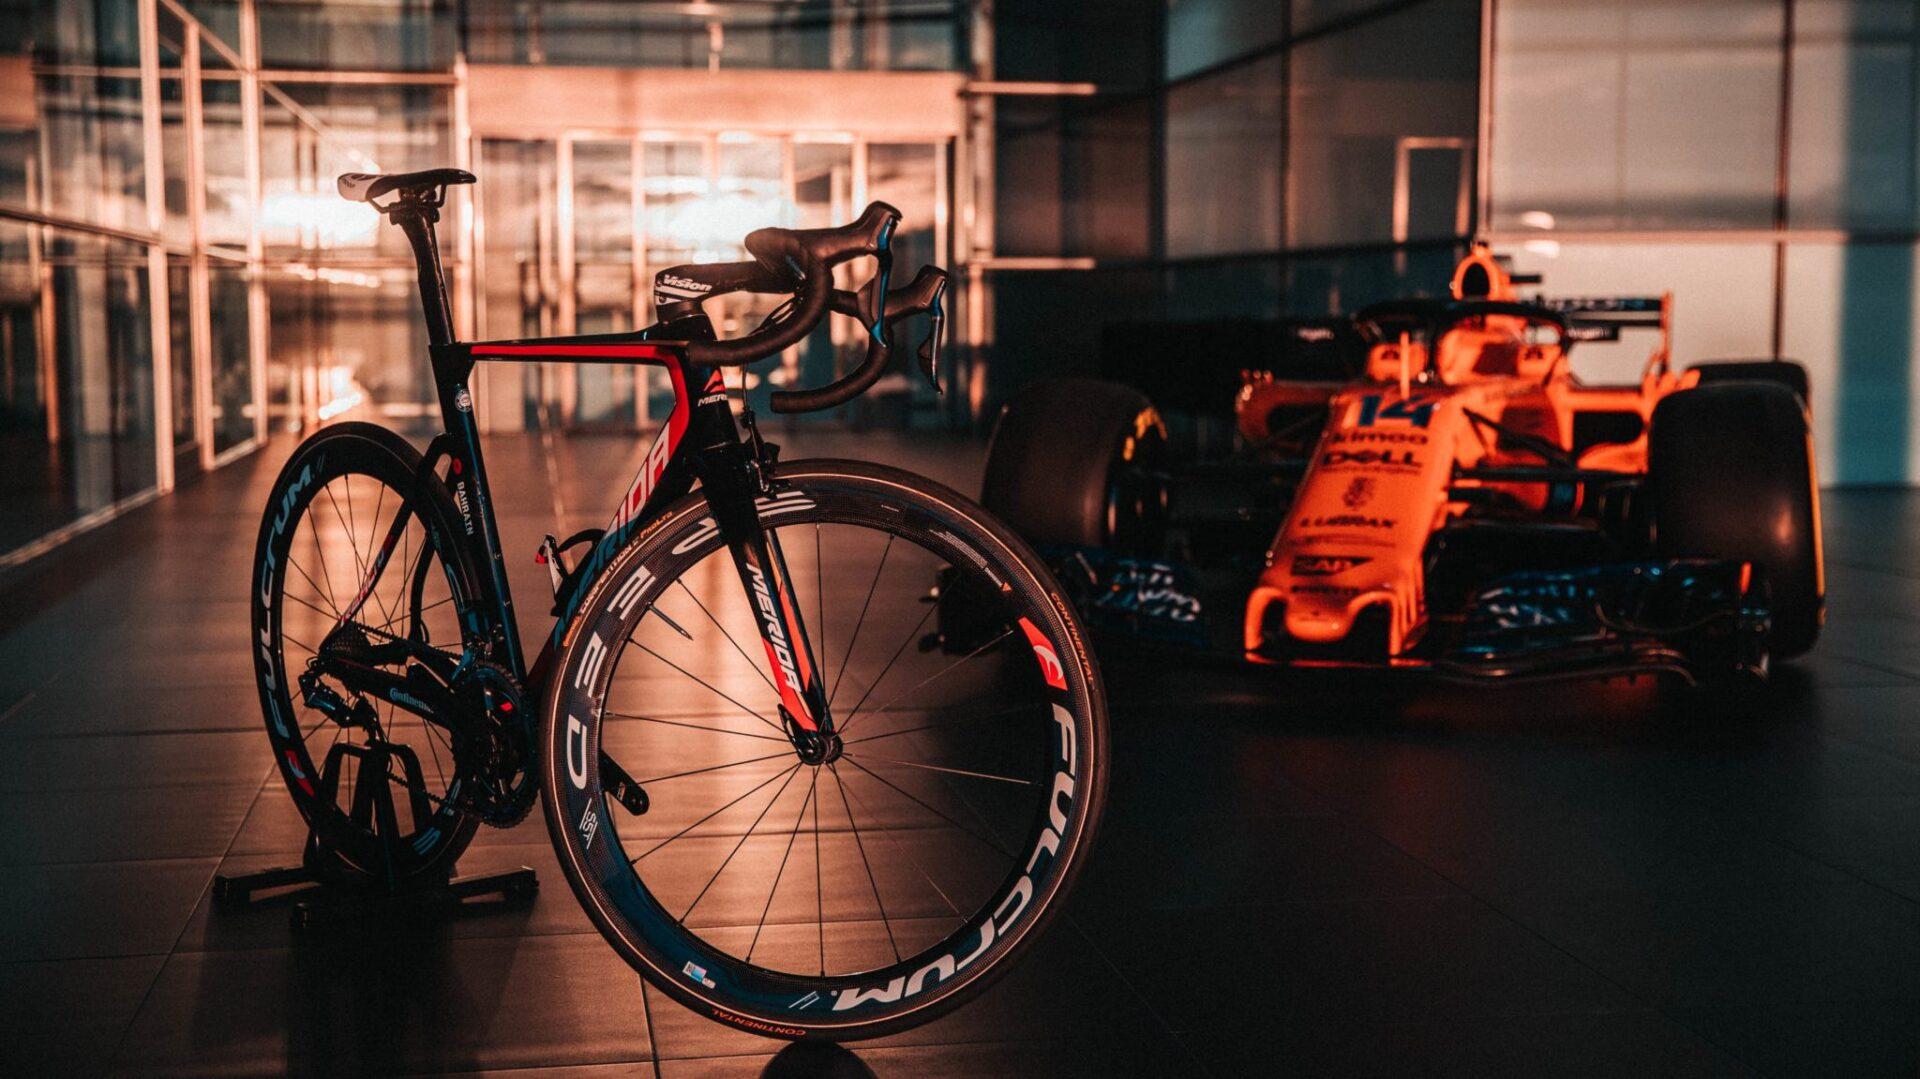 Equipa Bahrain-Merida passará a Bahrain-McLaren em 2020